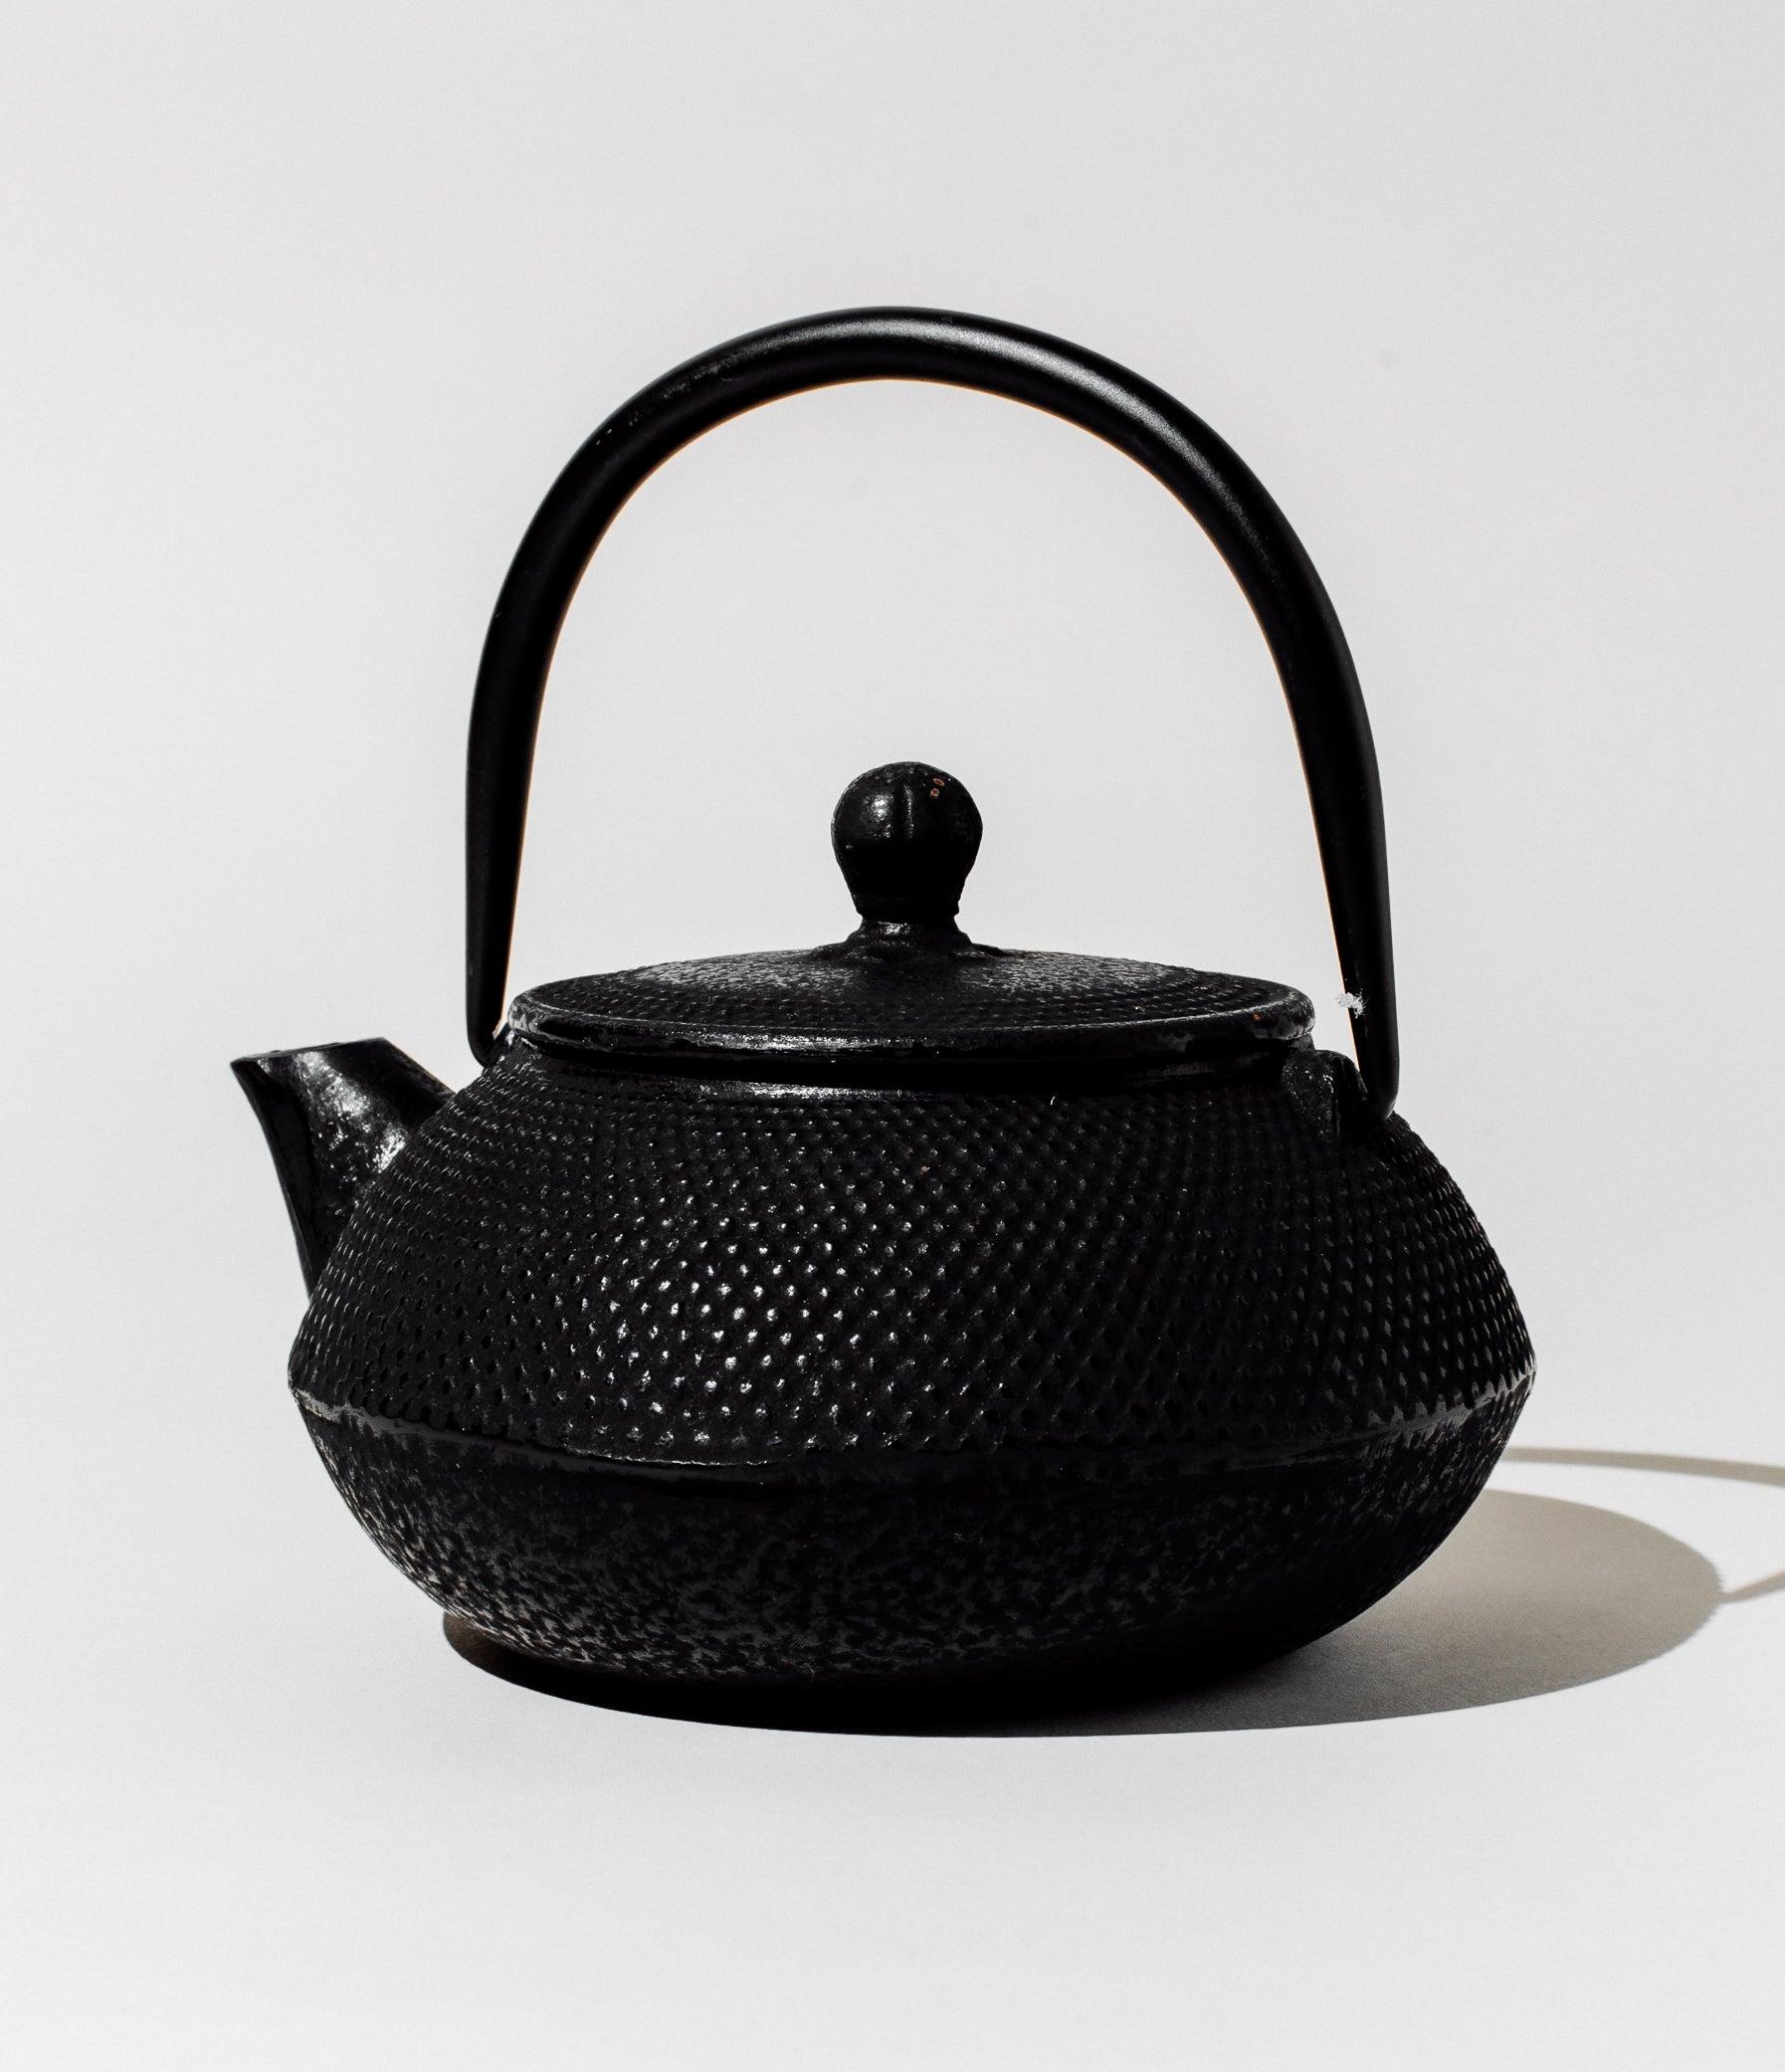 Tetsubin Cast Iron Tea Pot Teaware by Art of Tea